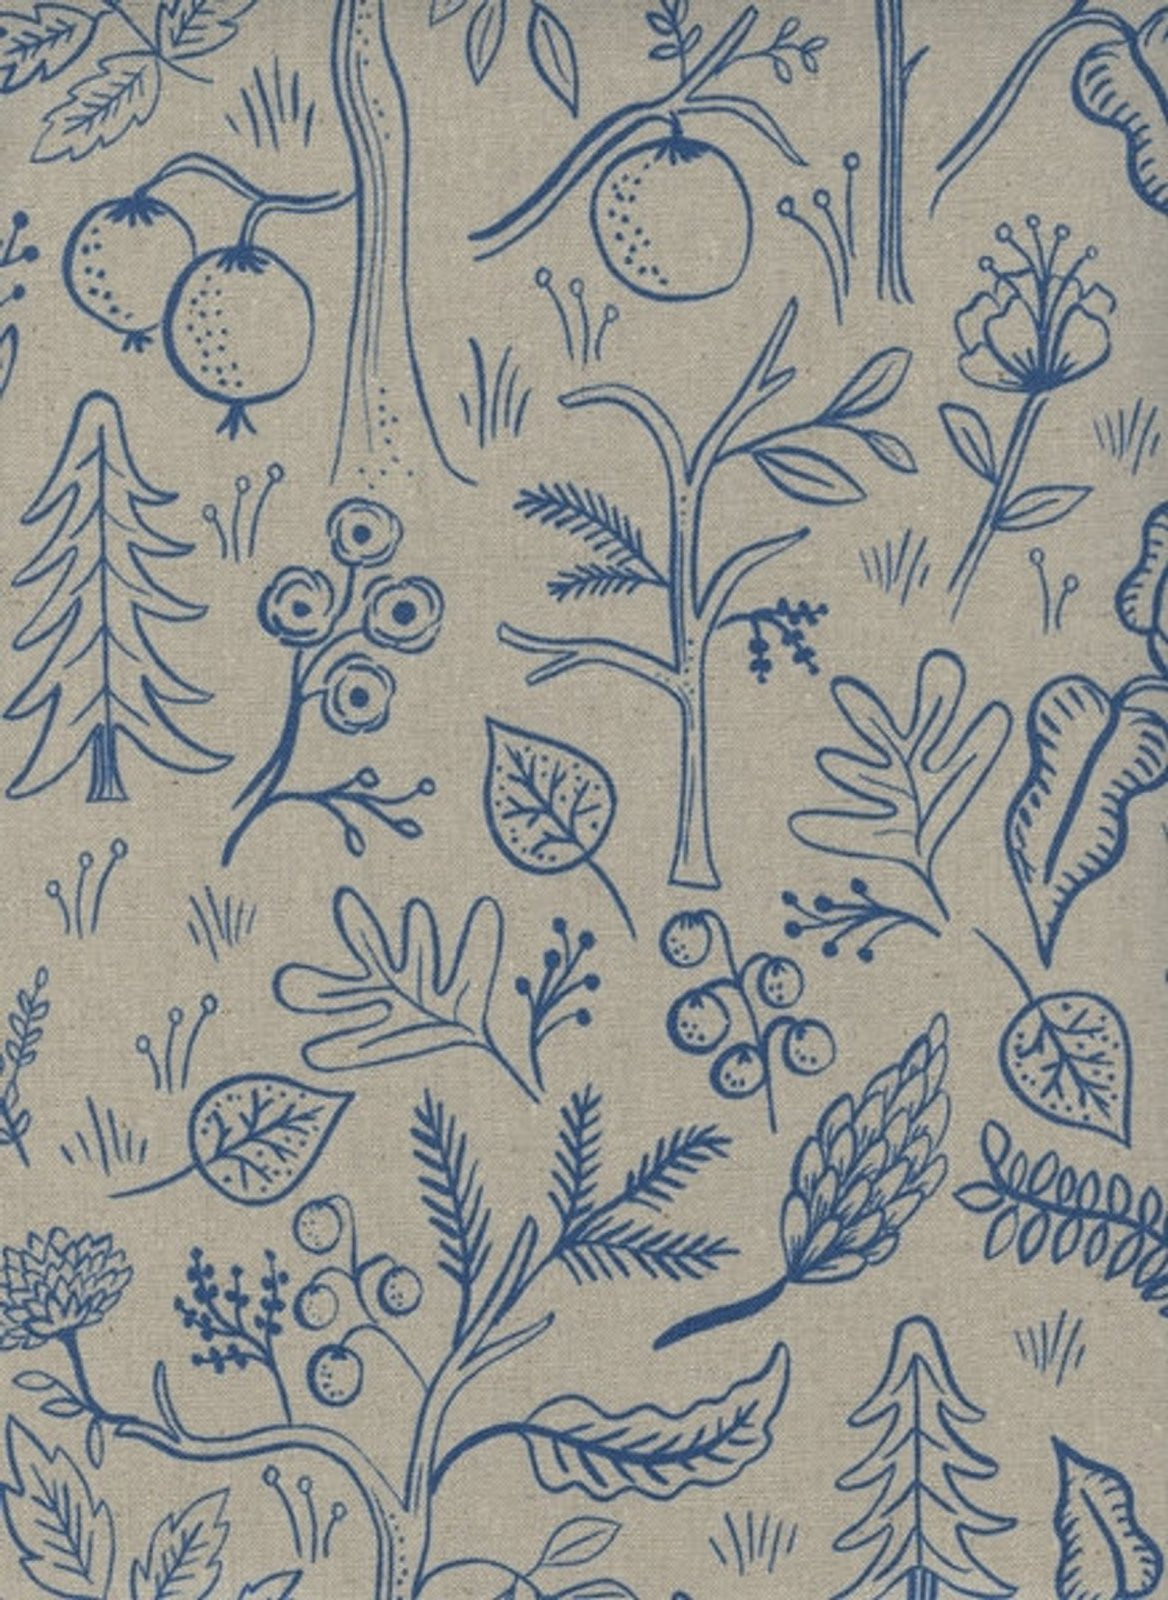 Cotton & Steel Canvas - Amalfi, Black Forrest